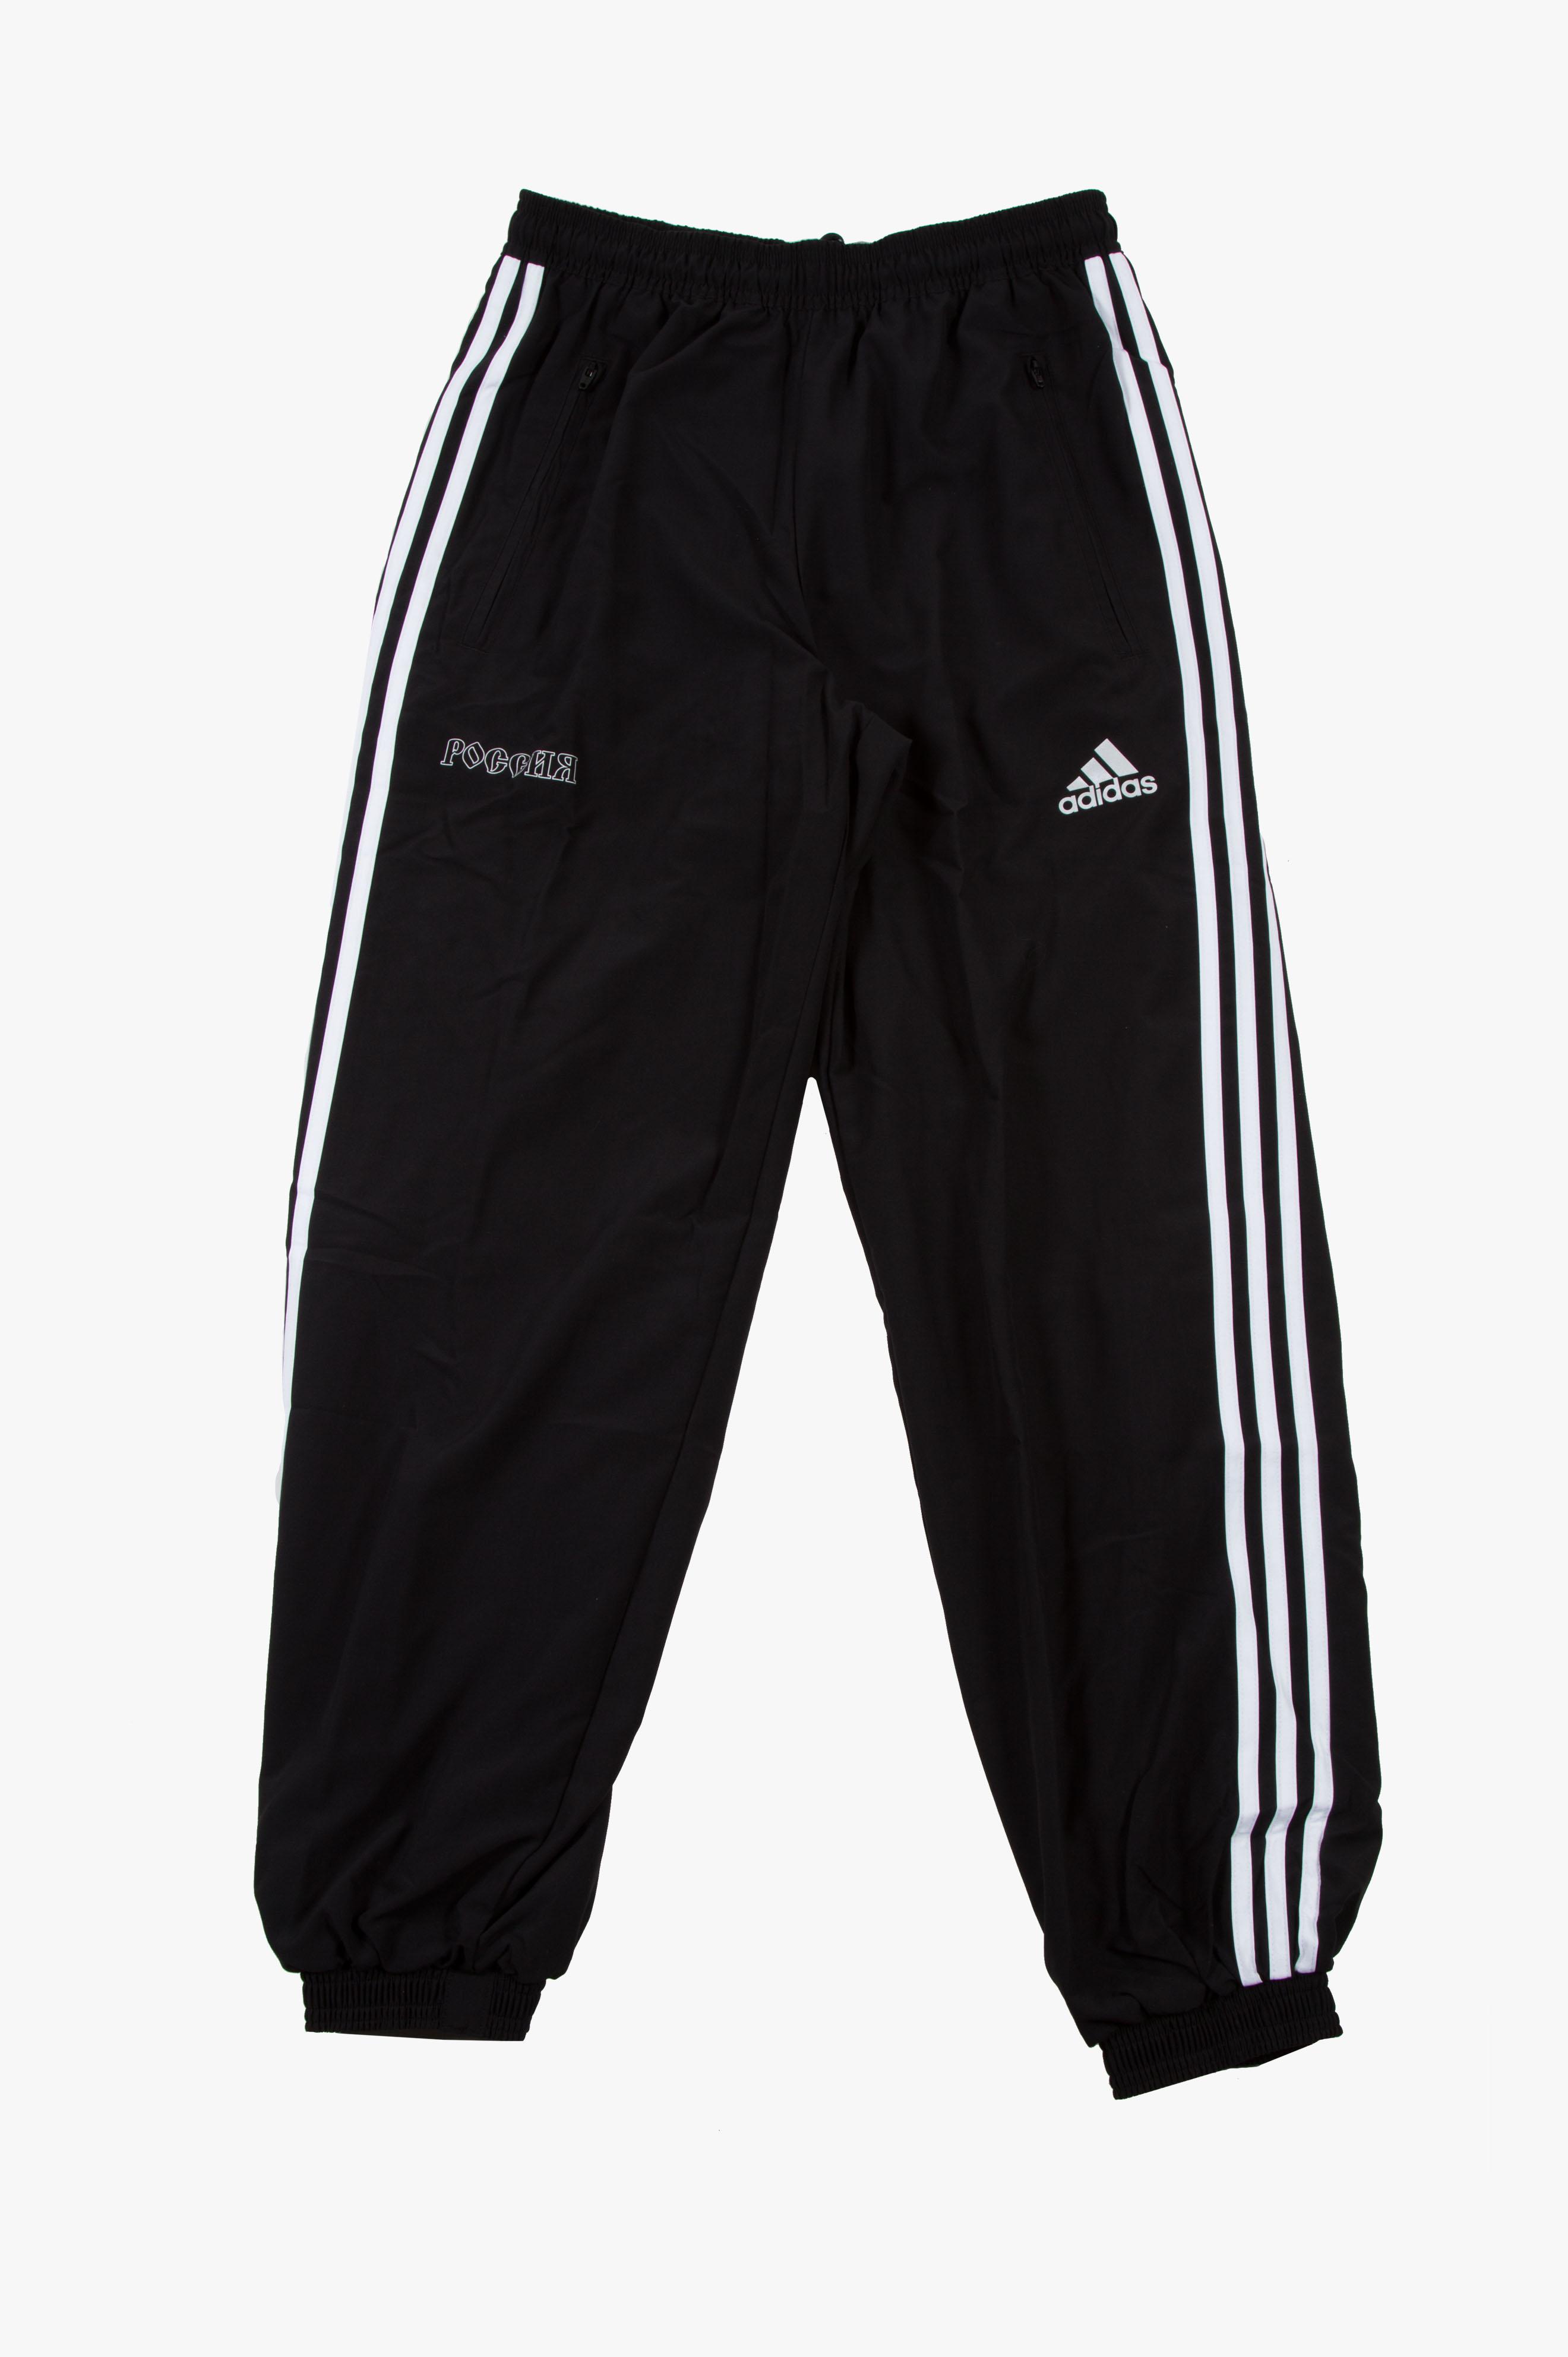 x Adidas Woven Pants Black